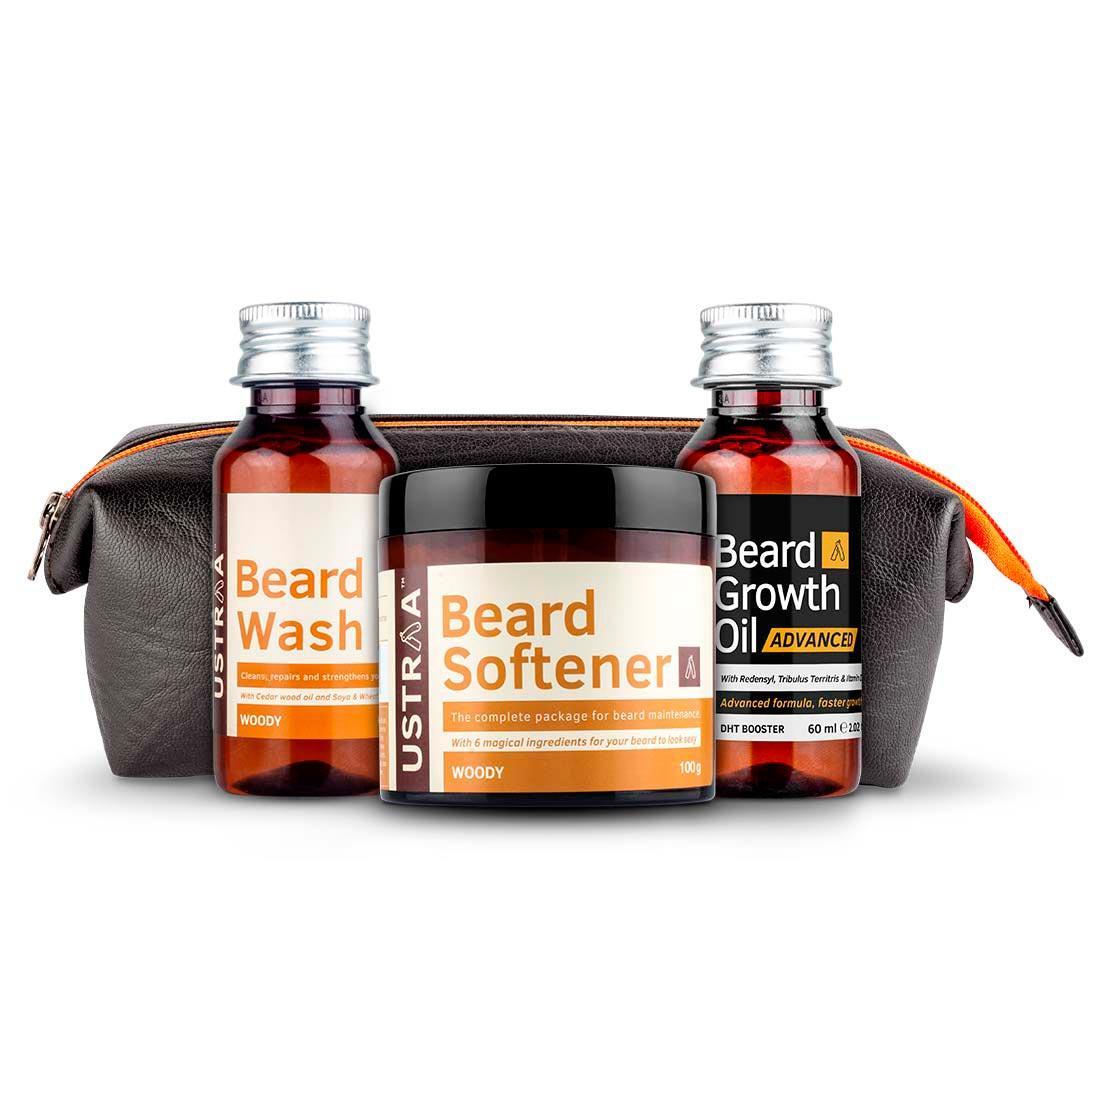 Ustraa Advance Beard Care Pack for Men: Beard Growth Oil-Advance, Beard Softener (Woody), Beard Wash (Woody)